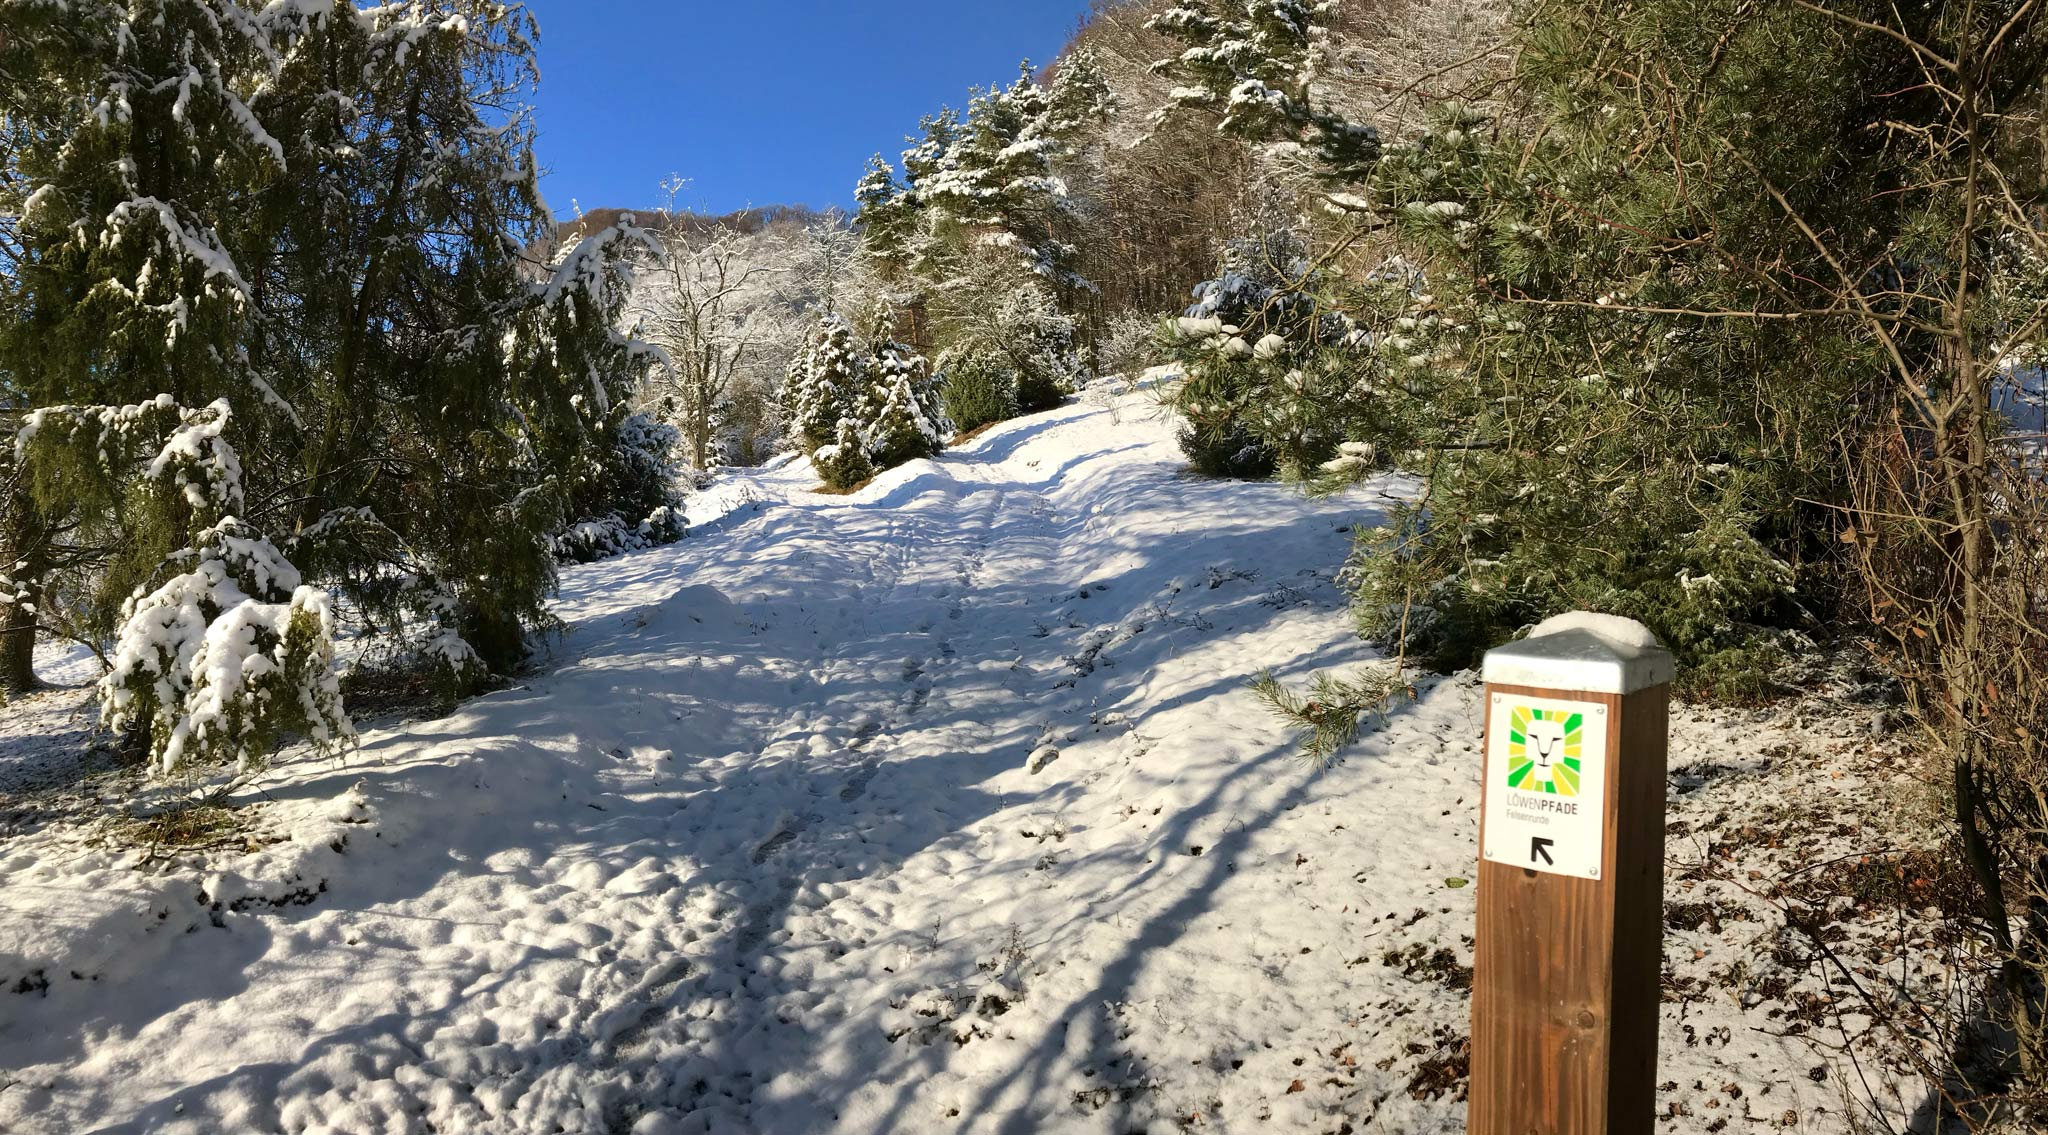 Winterwanderung auf dem Löwenpfad Felsenrunde © Landratsamt Göppingen